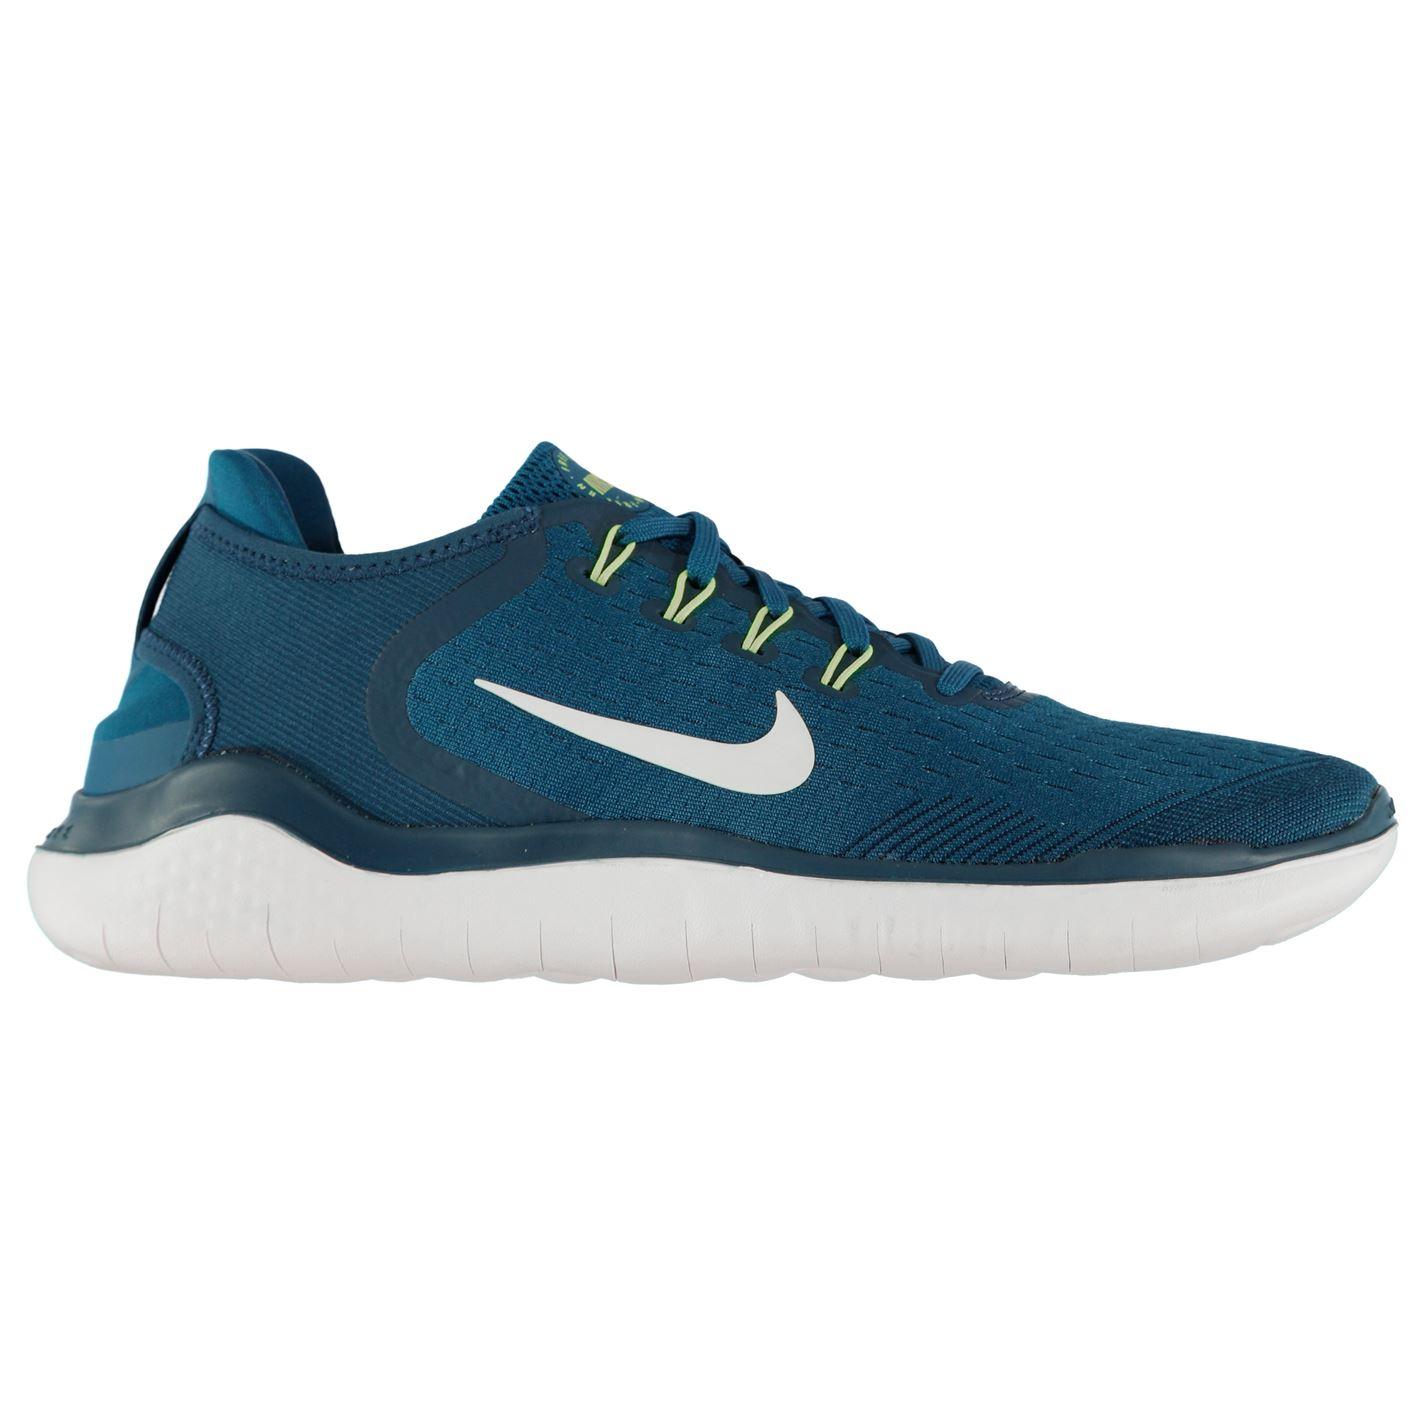 boty Nike Free Run 2018 pánské